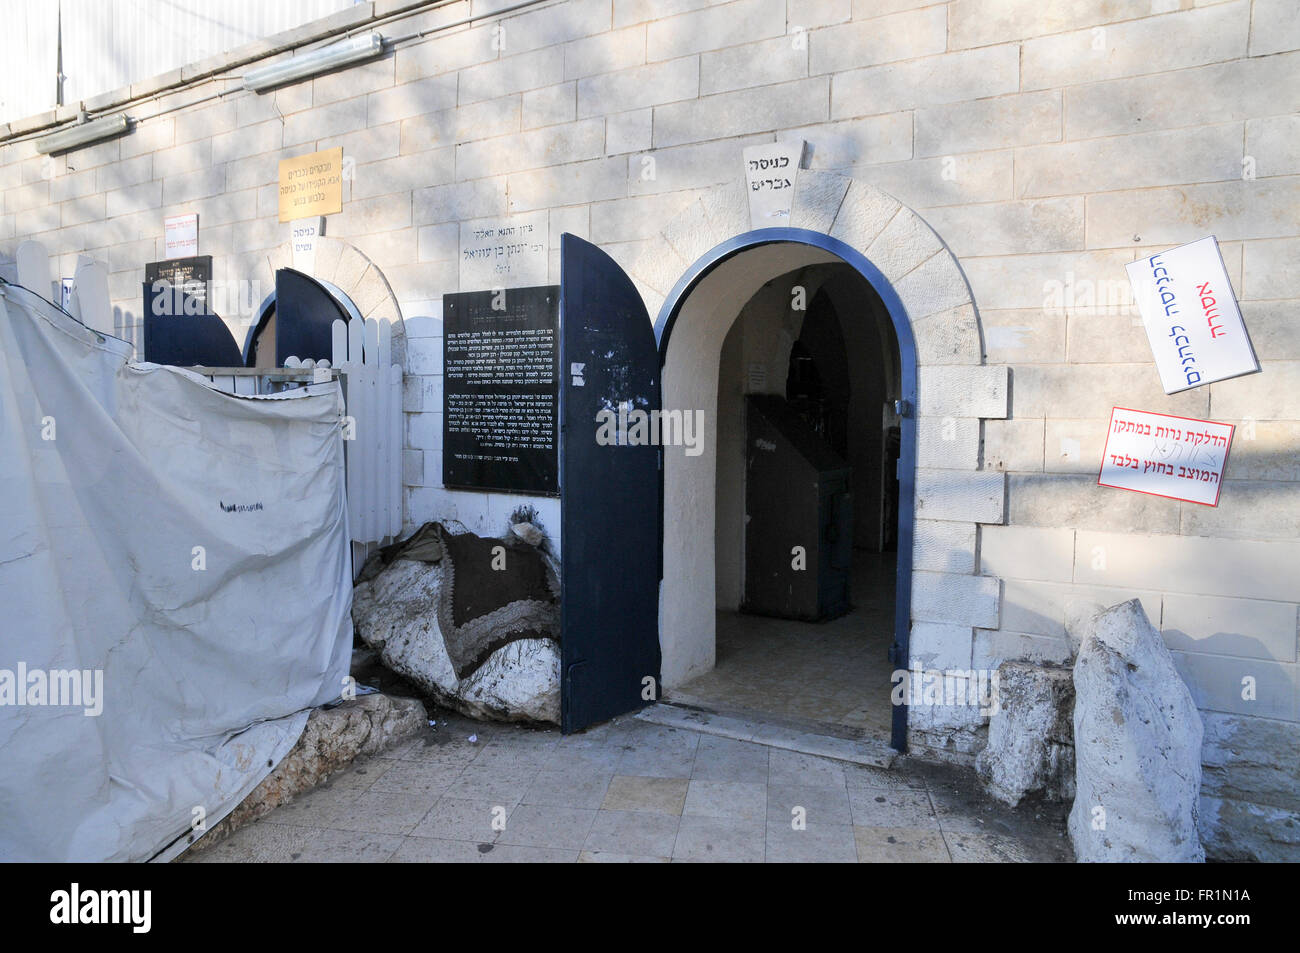 Israel, Upper Galilee, Amuka, Exterior of the grave of Yonatan ben Uziel, Pilgrimage site for believers seeking - Stock Image